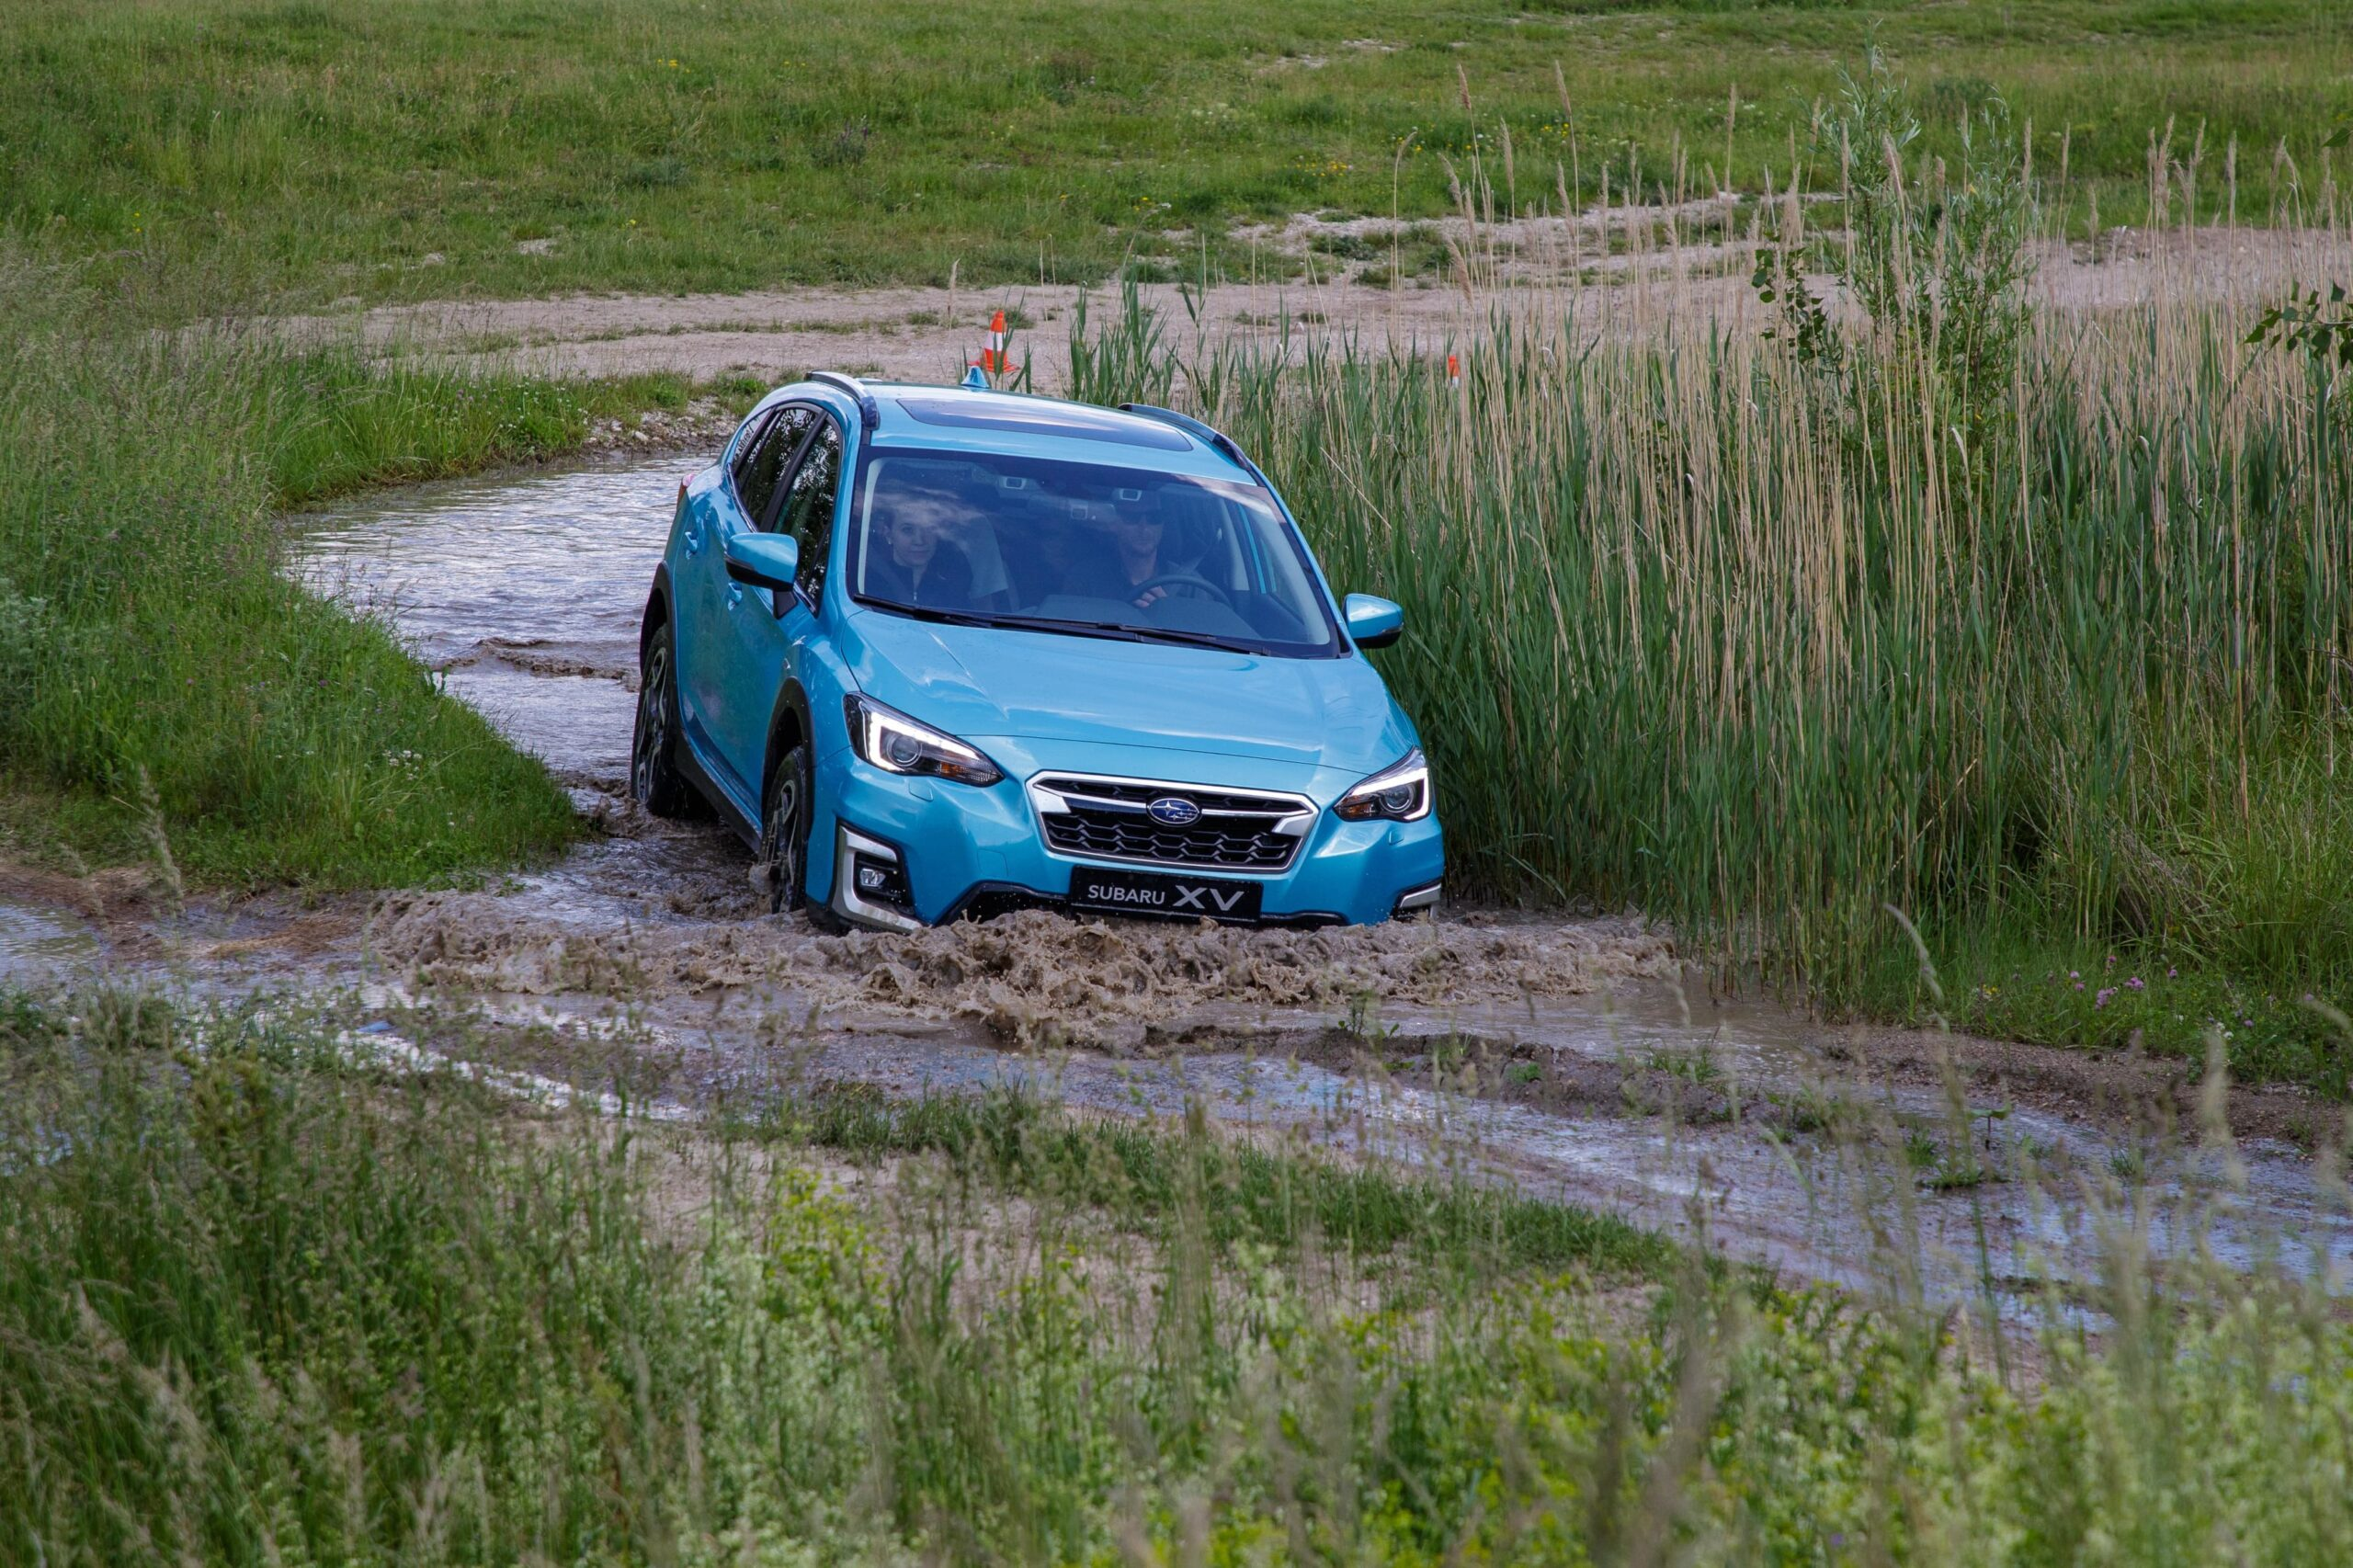 Subaru XV Off Road